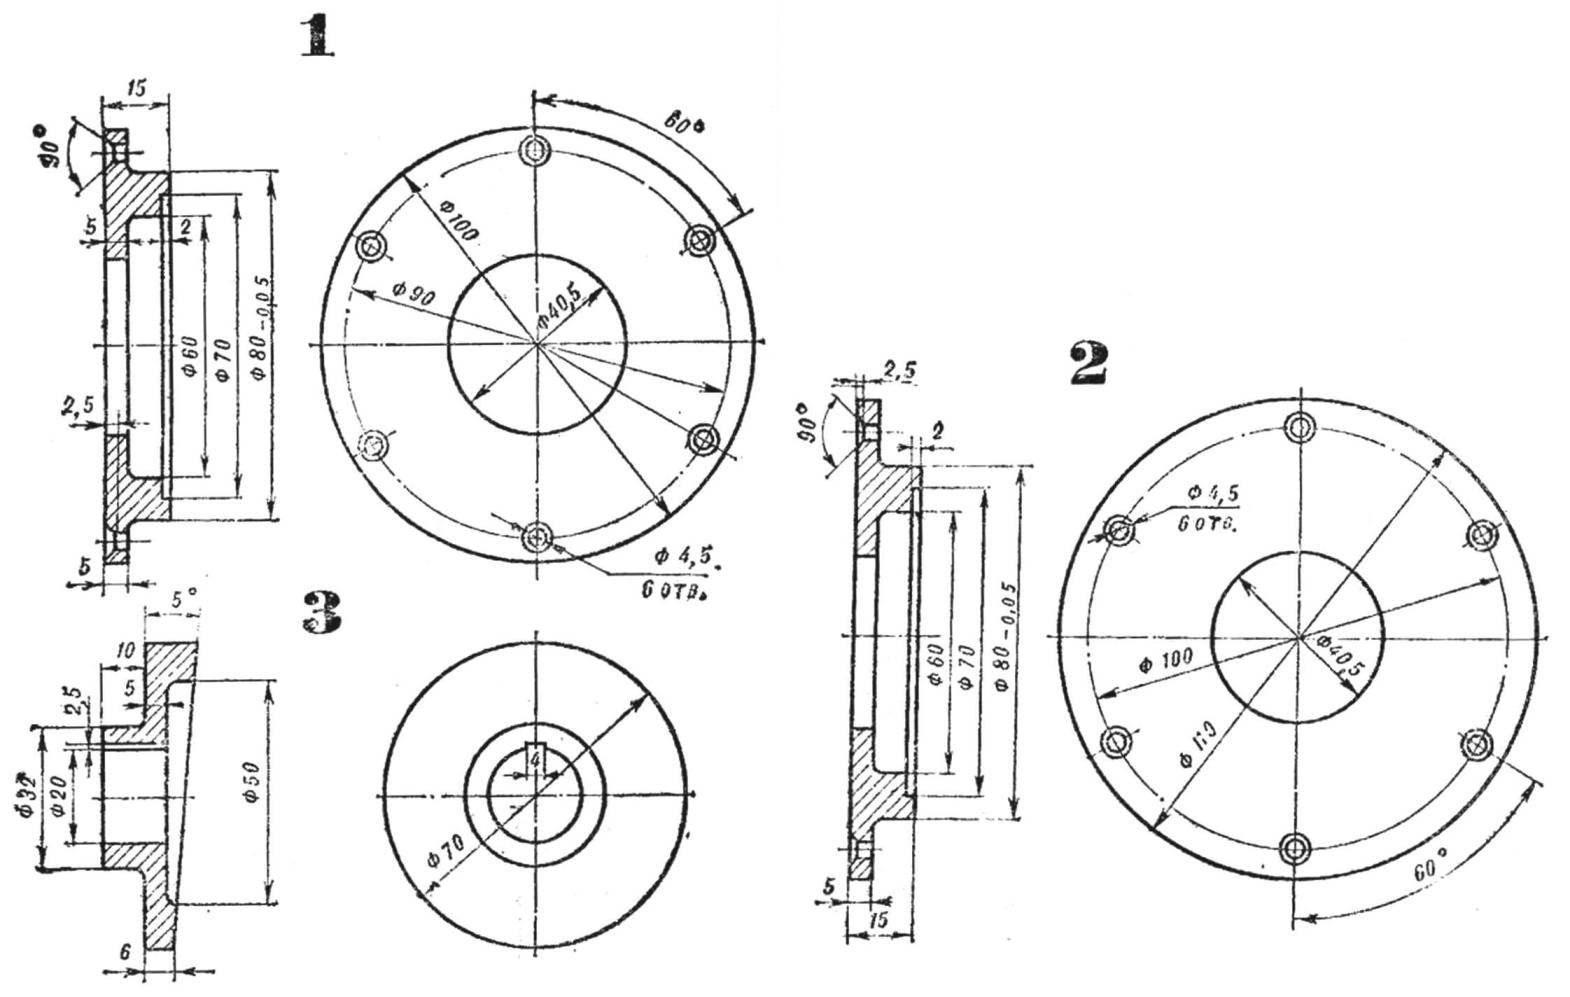 Fig. 6. Homemade engine parts